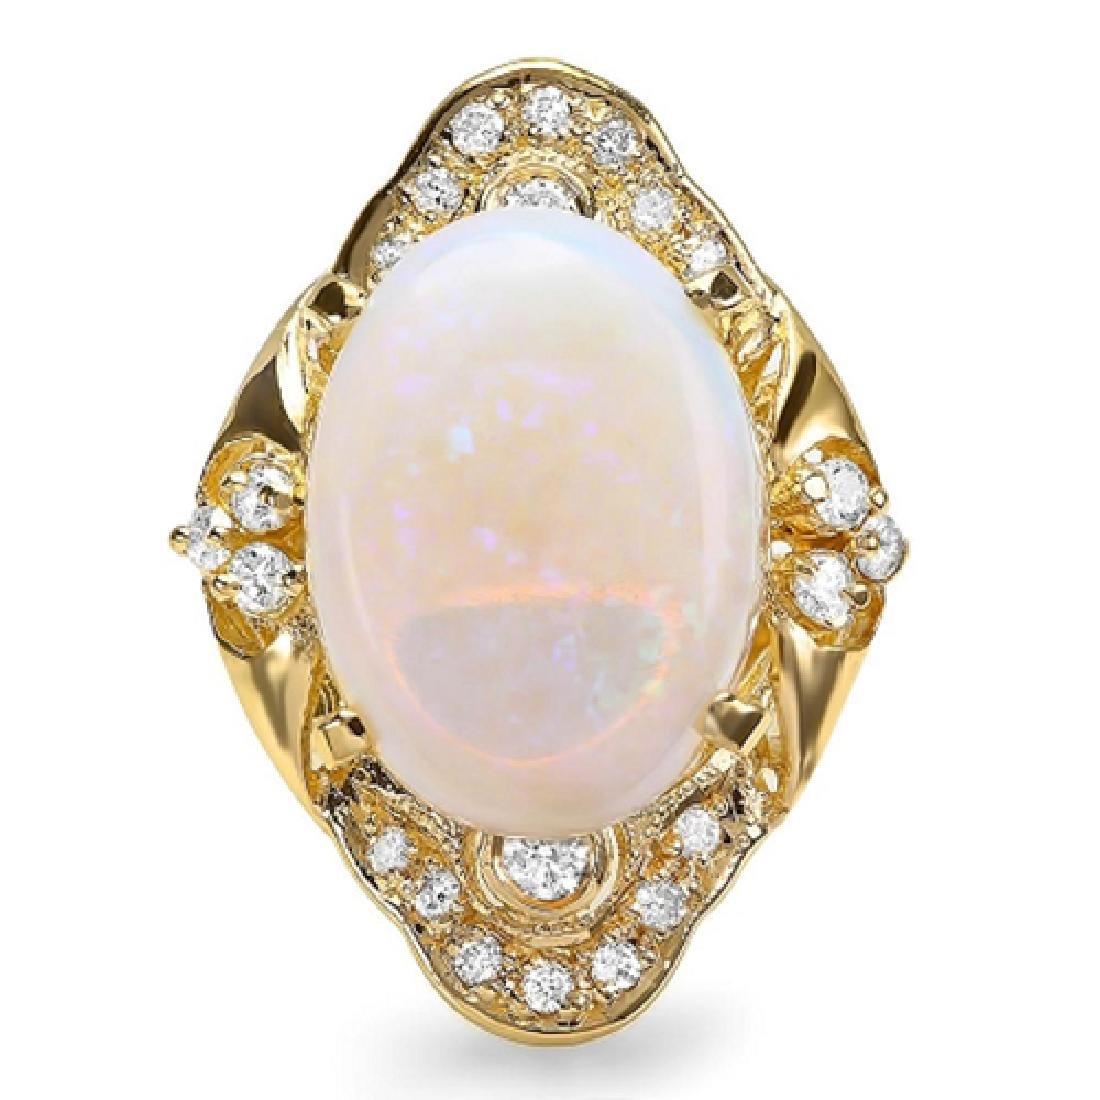 9.85 Carat Natural Opal 18K Solid Yellow Gold Diamond